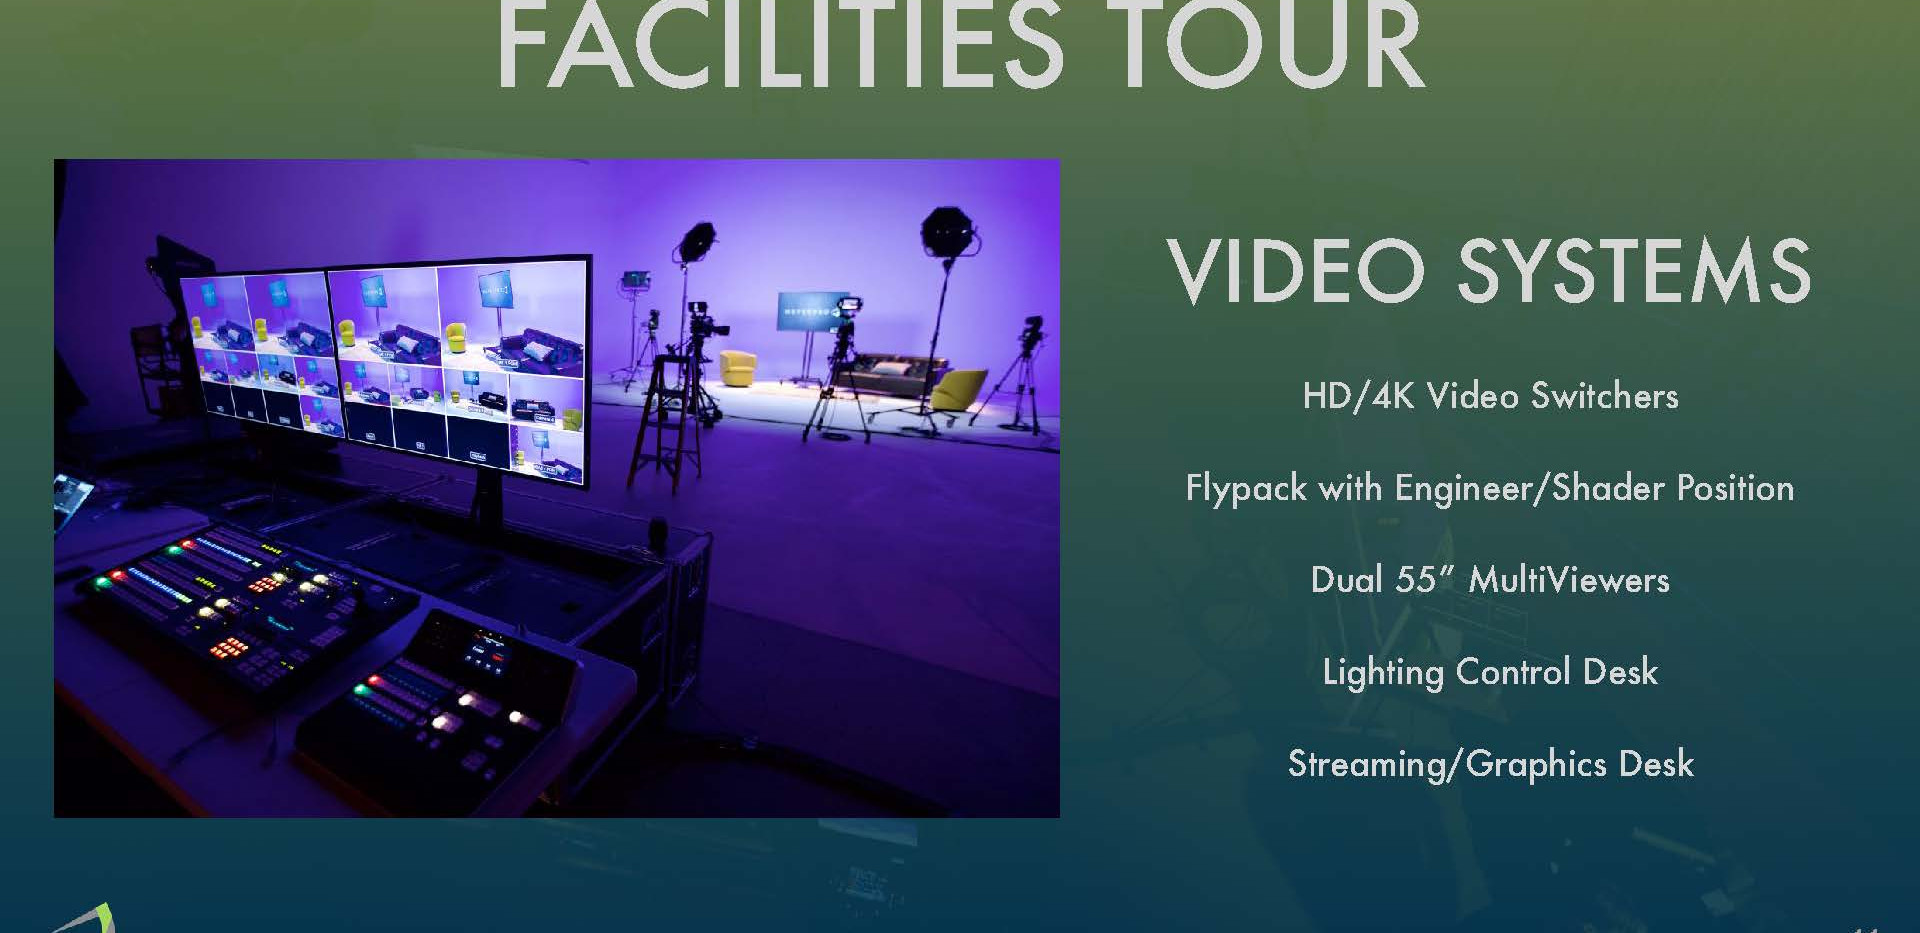 Facilites Tour - Video Systems